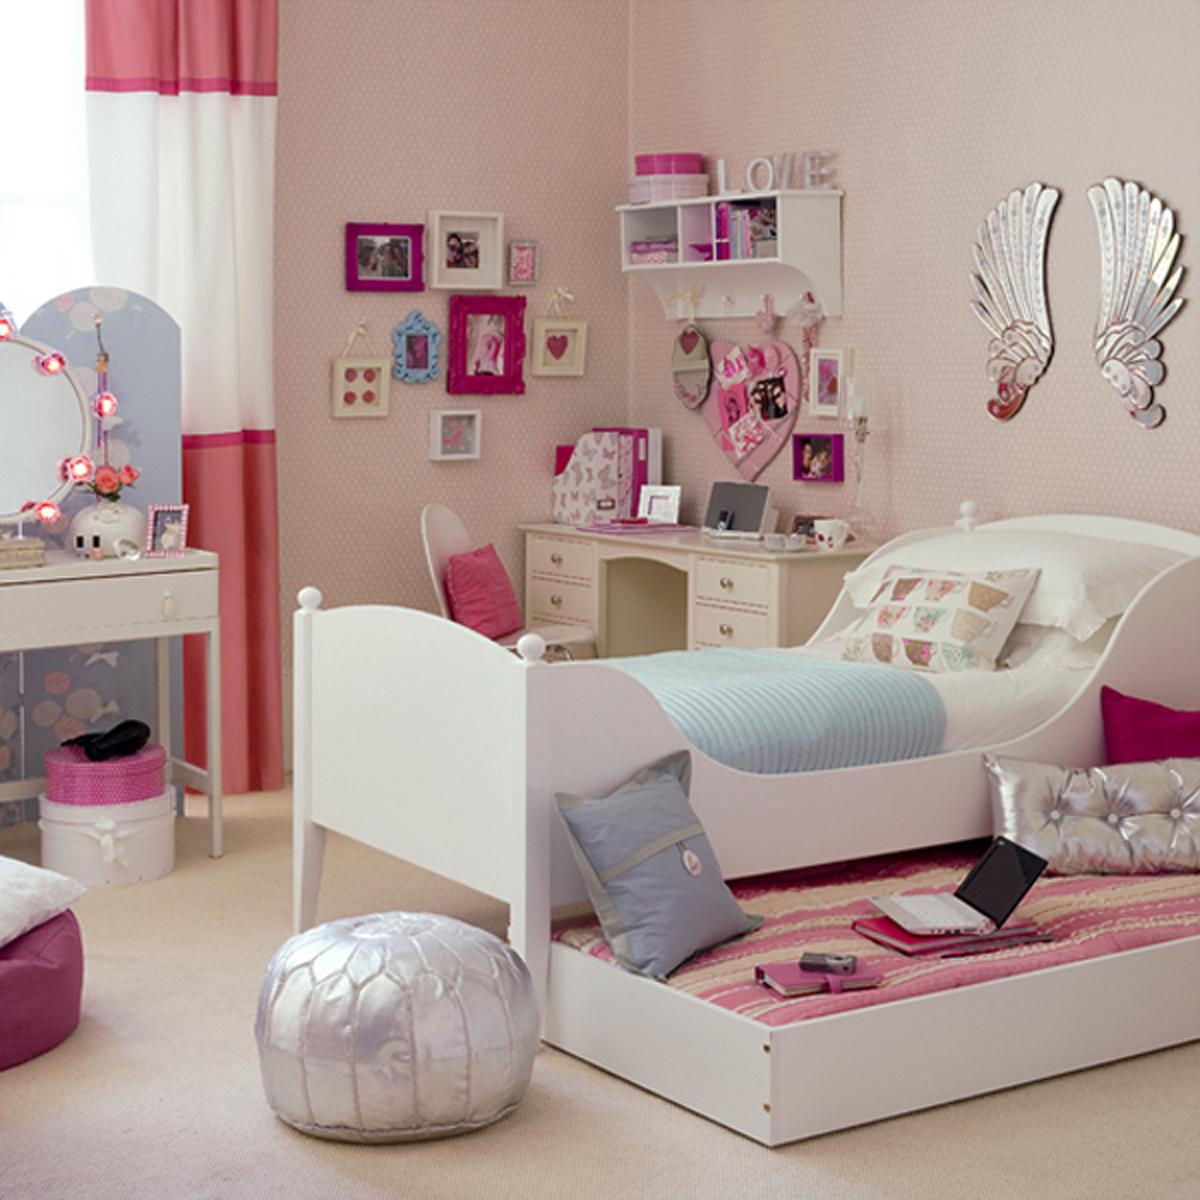 decor for teenage bedroom photo - 2